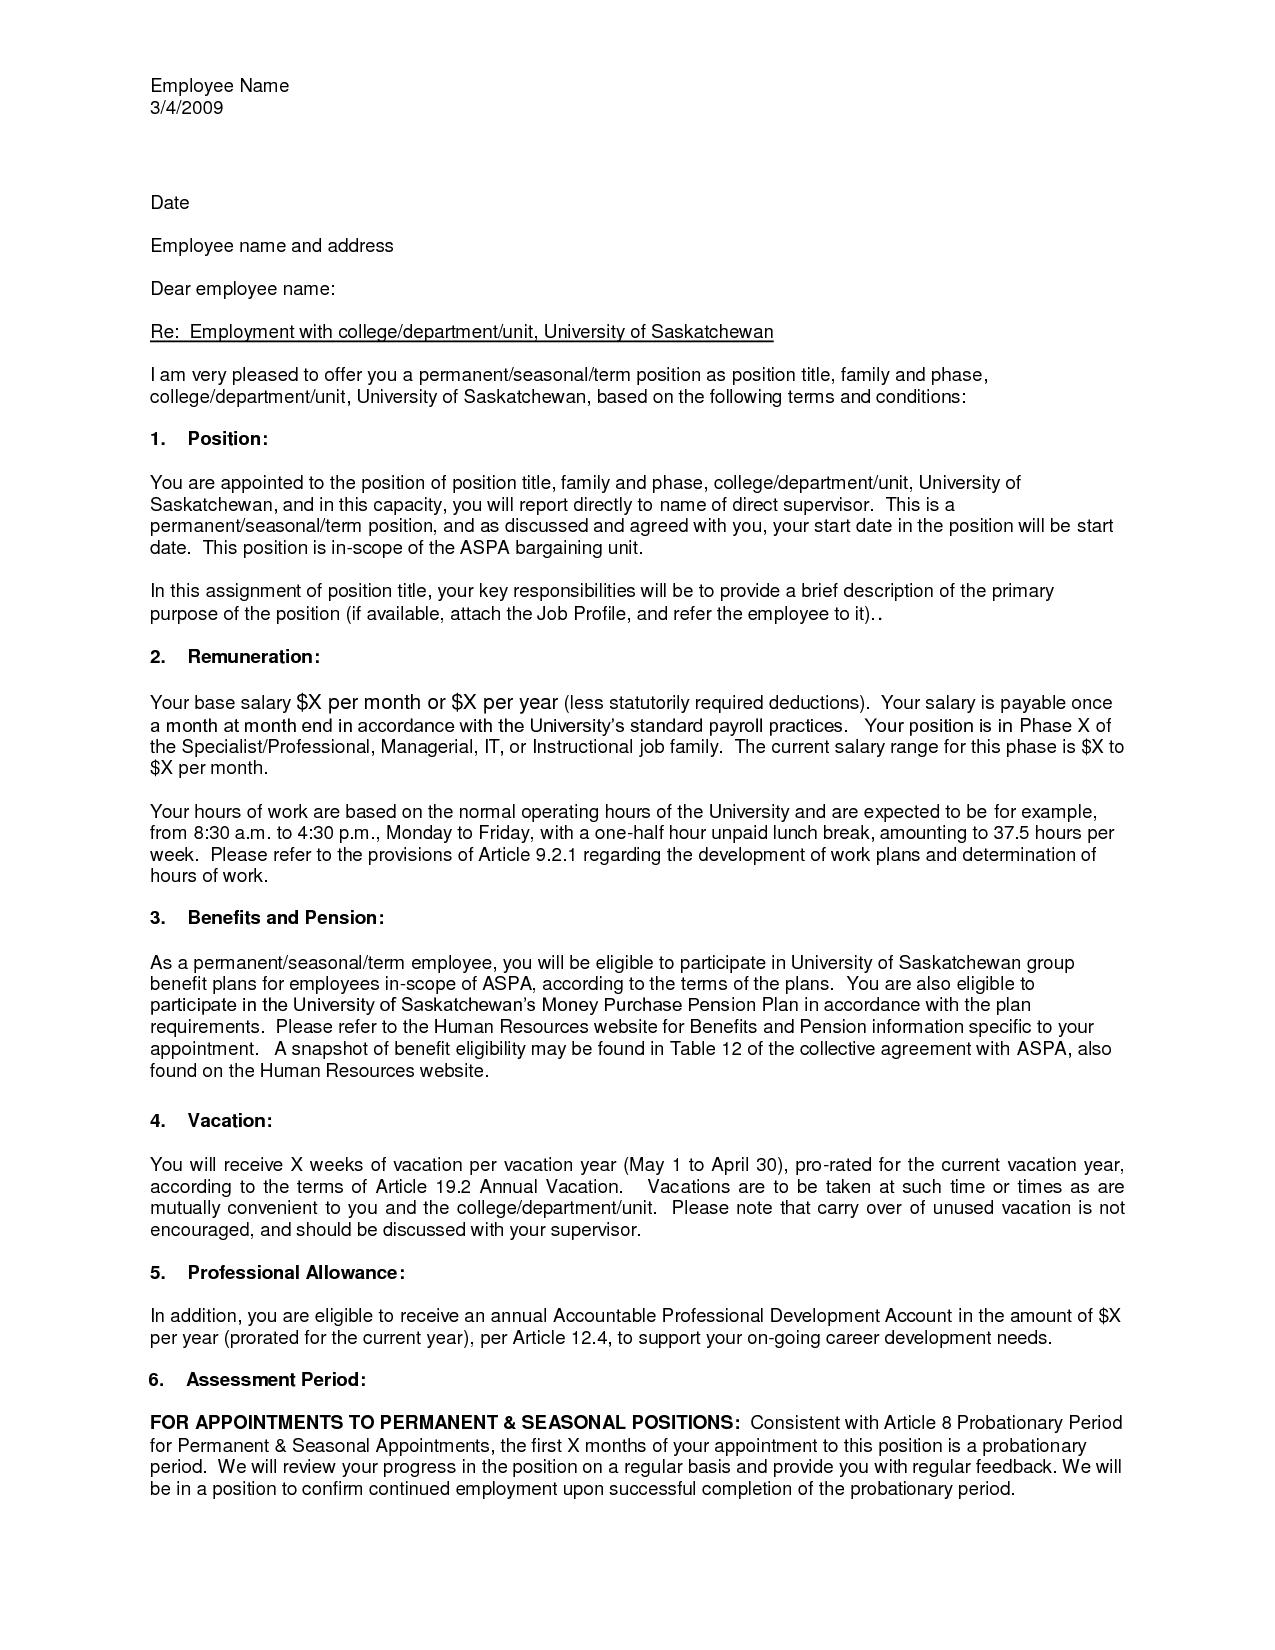 Job Offer Document Template Job offer, Confirmation